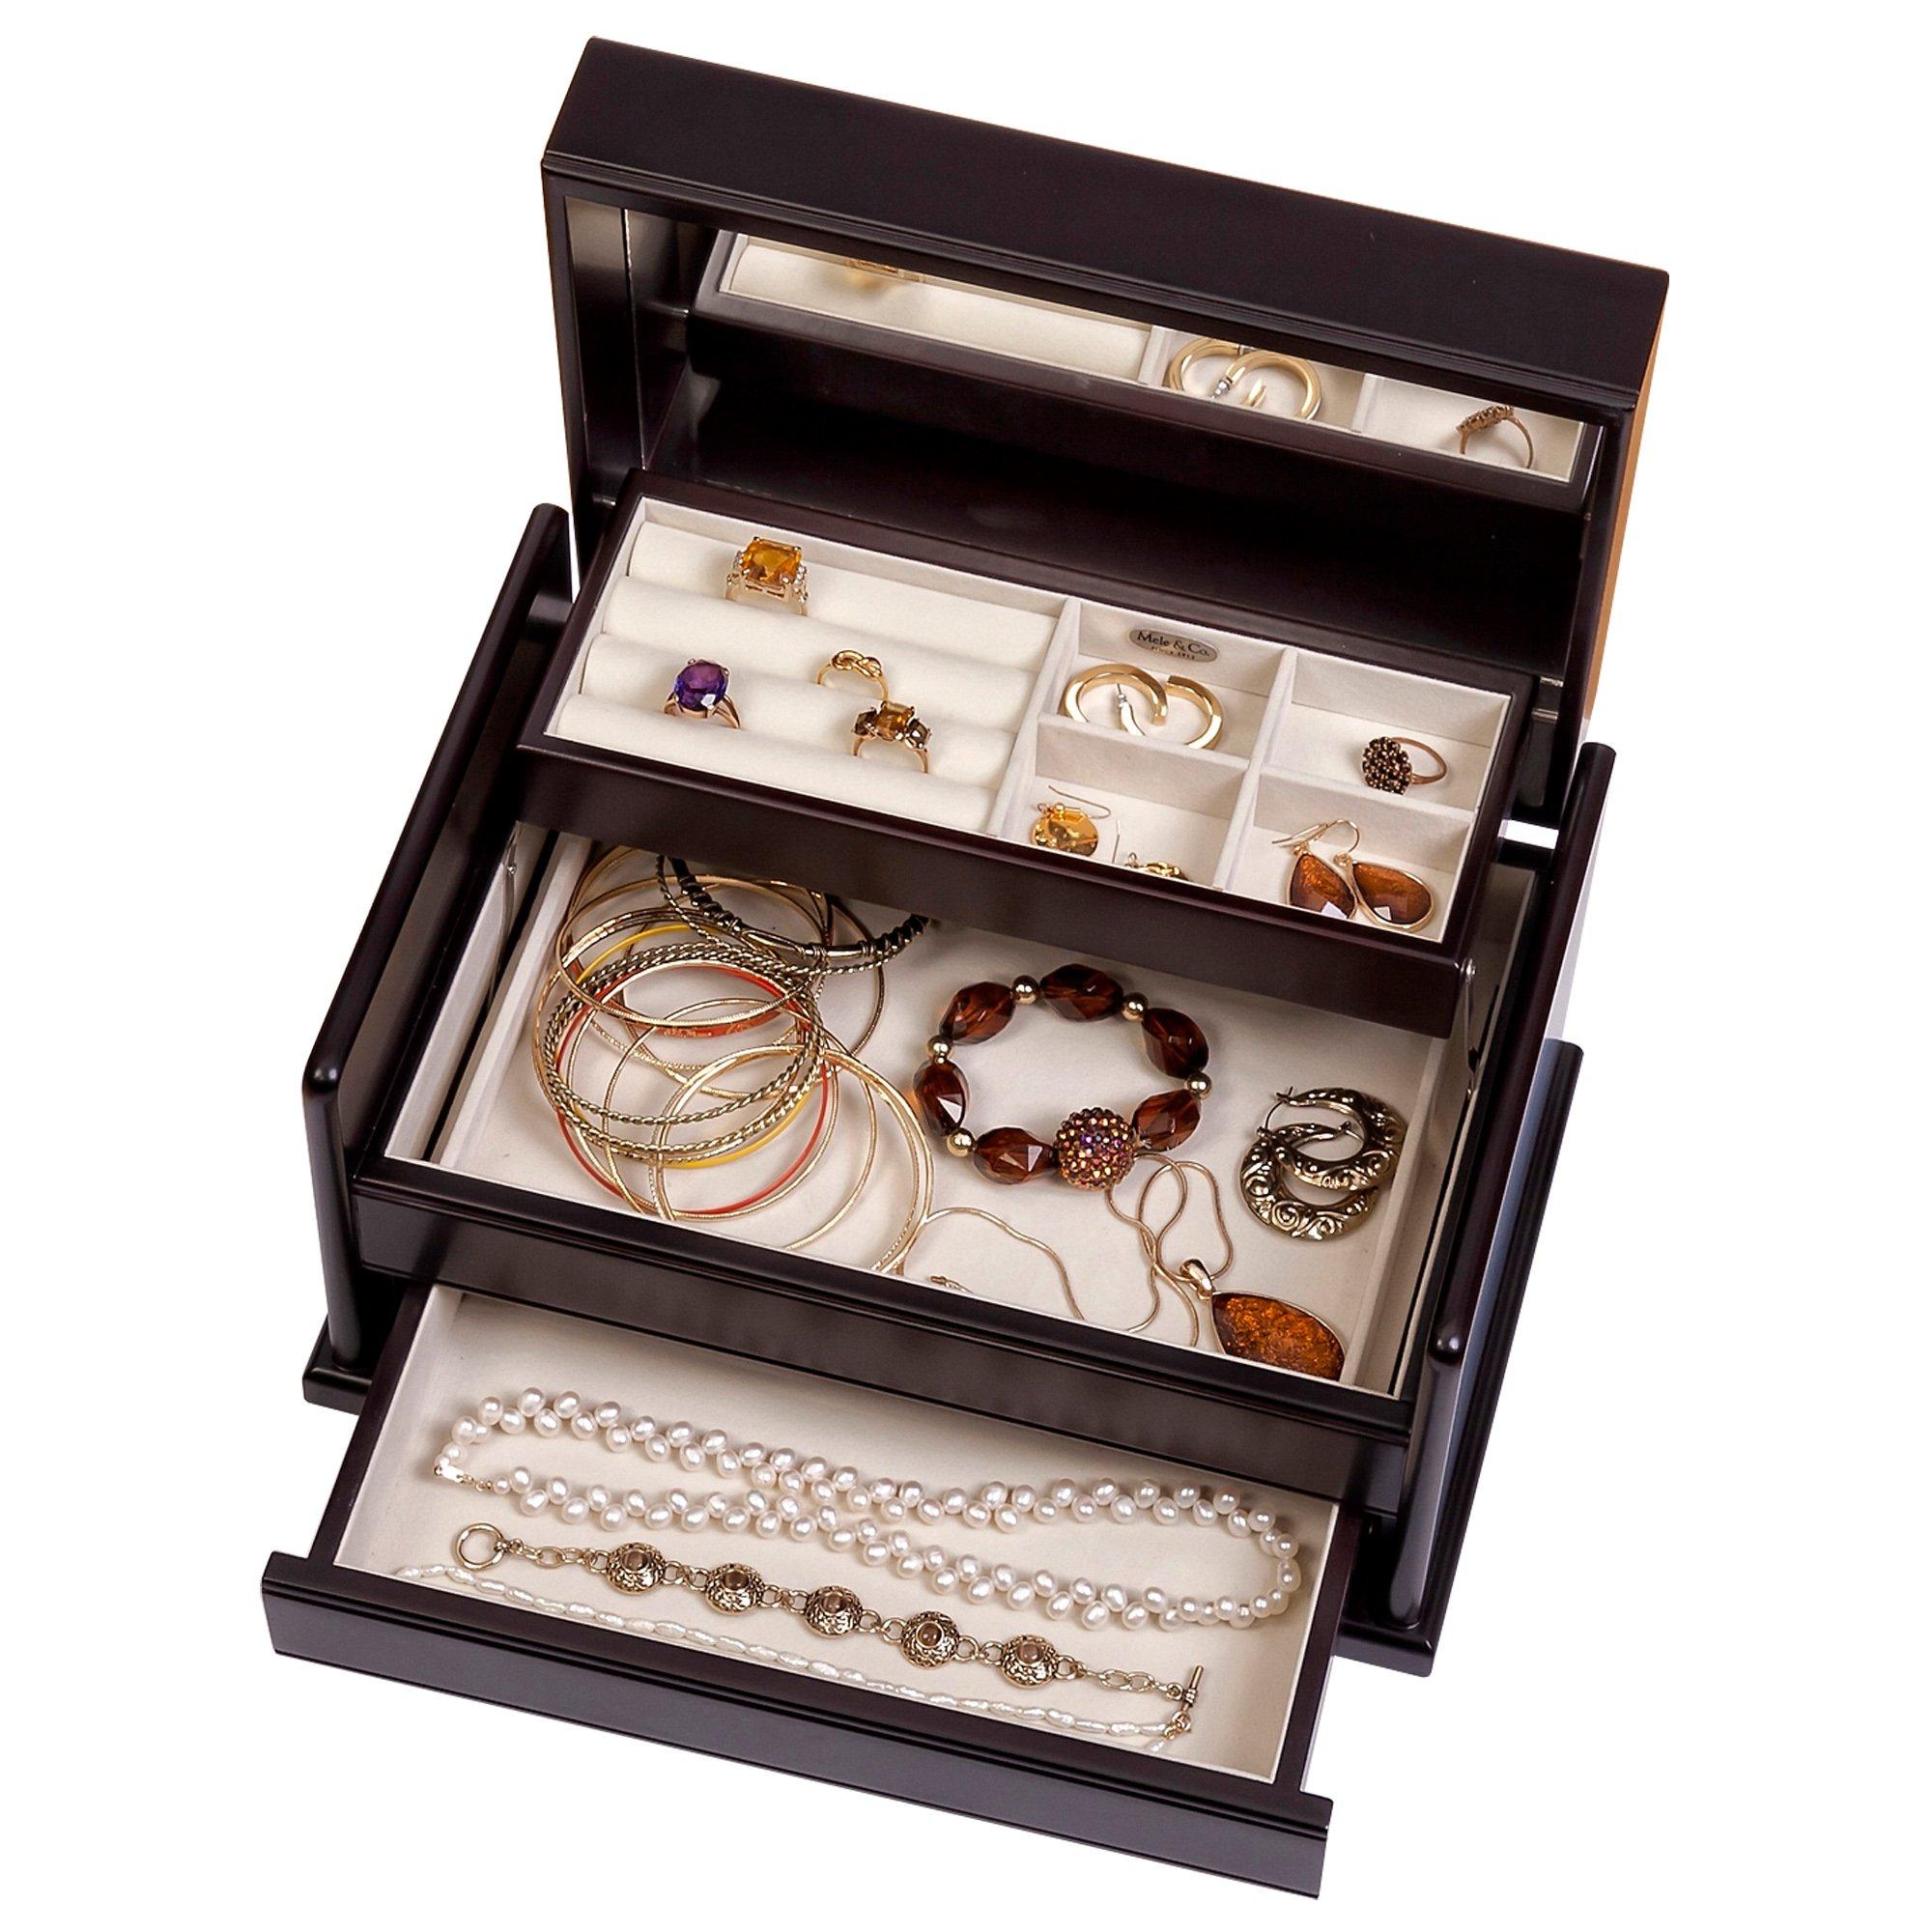 Mele & Co. Juliette Wooden Jewelry Box (Java Finish) by Mele & Co. (Image #3)